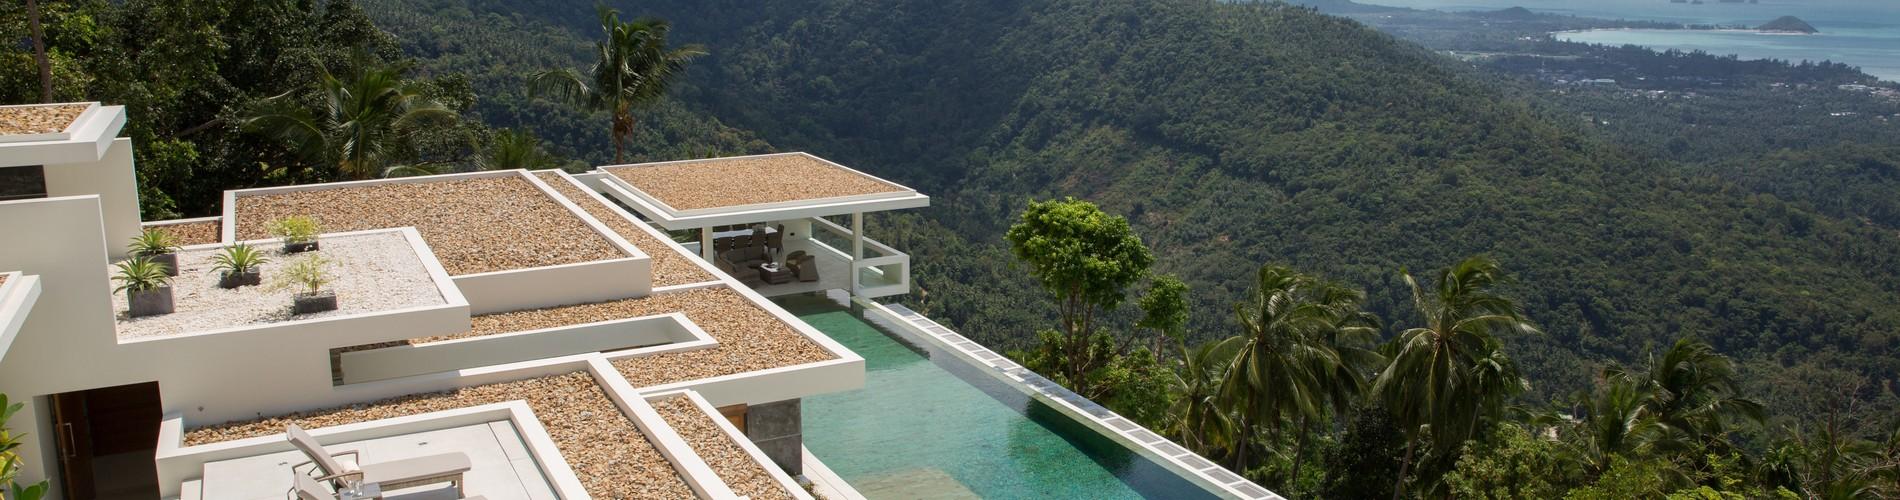 Vacation Rental Lime Samui Villas Splash+Spice, 10.5 Bdrm